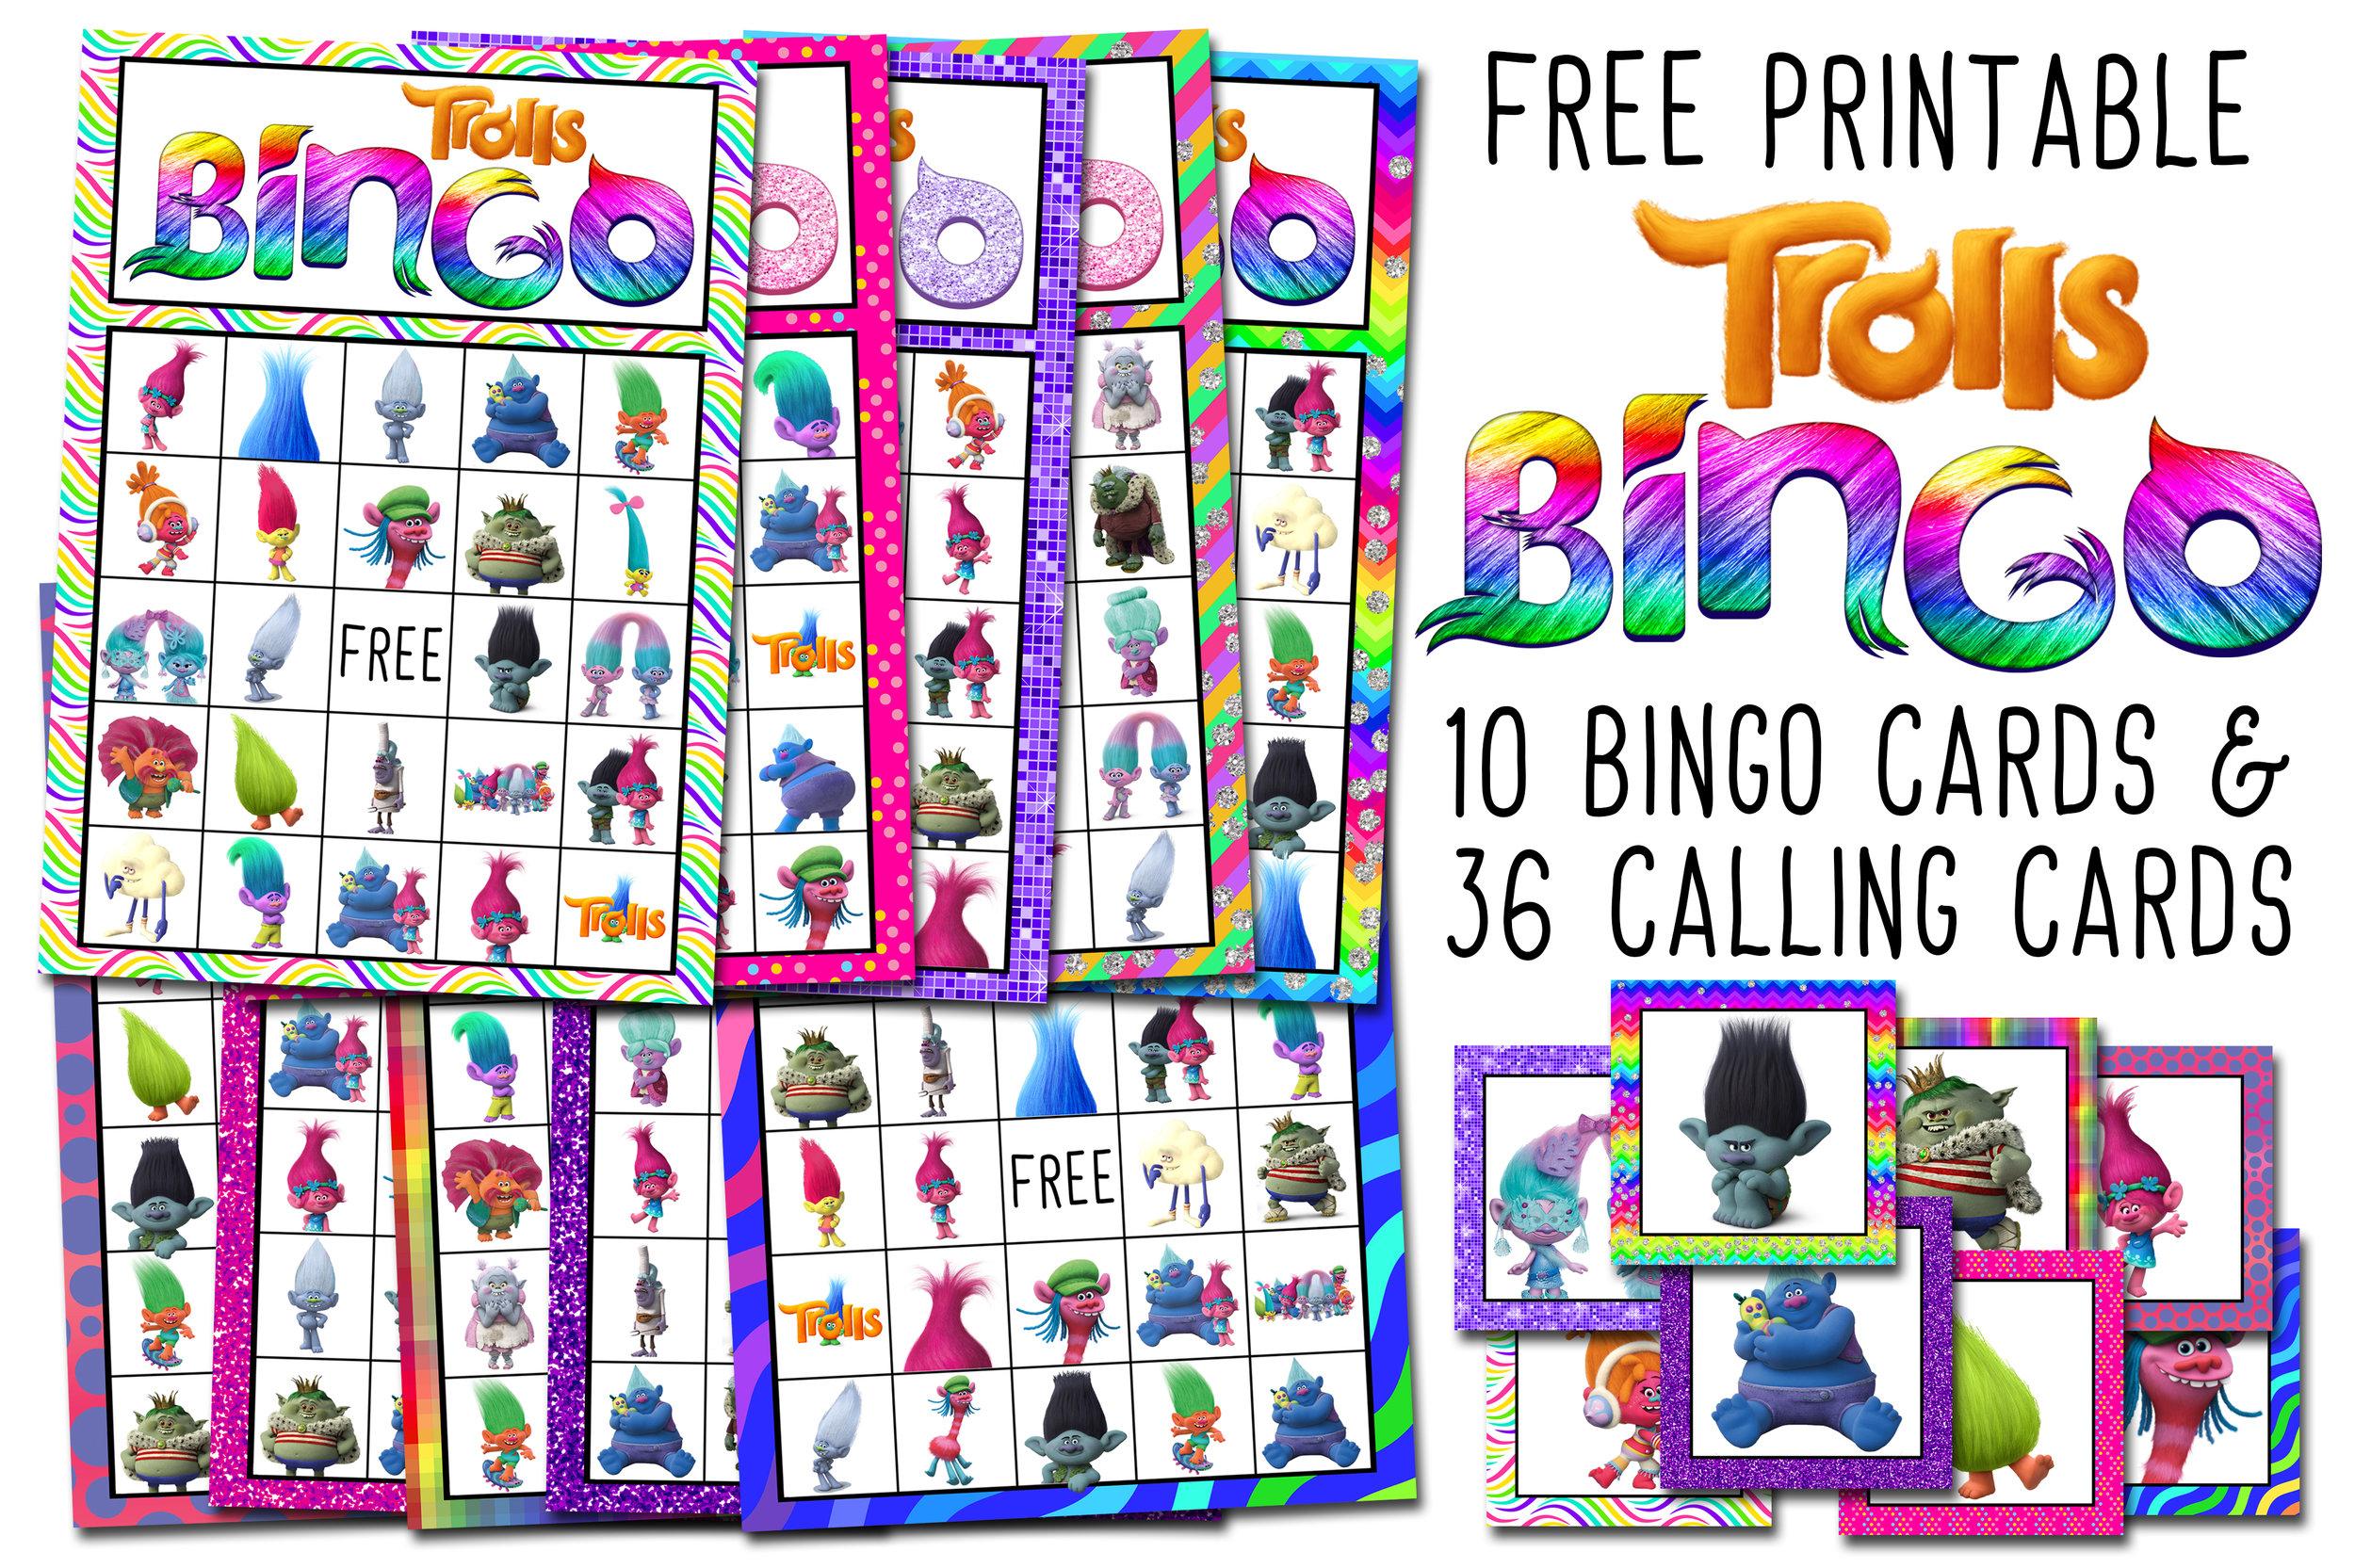 Trolls Free Printable Bingo Game Cards